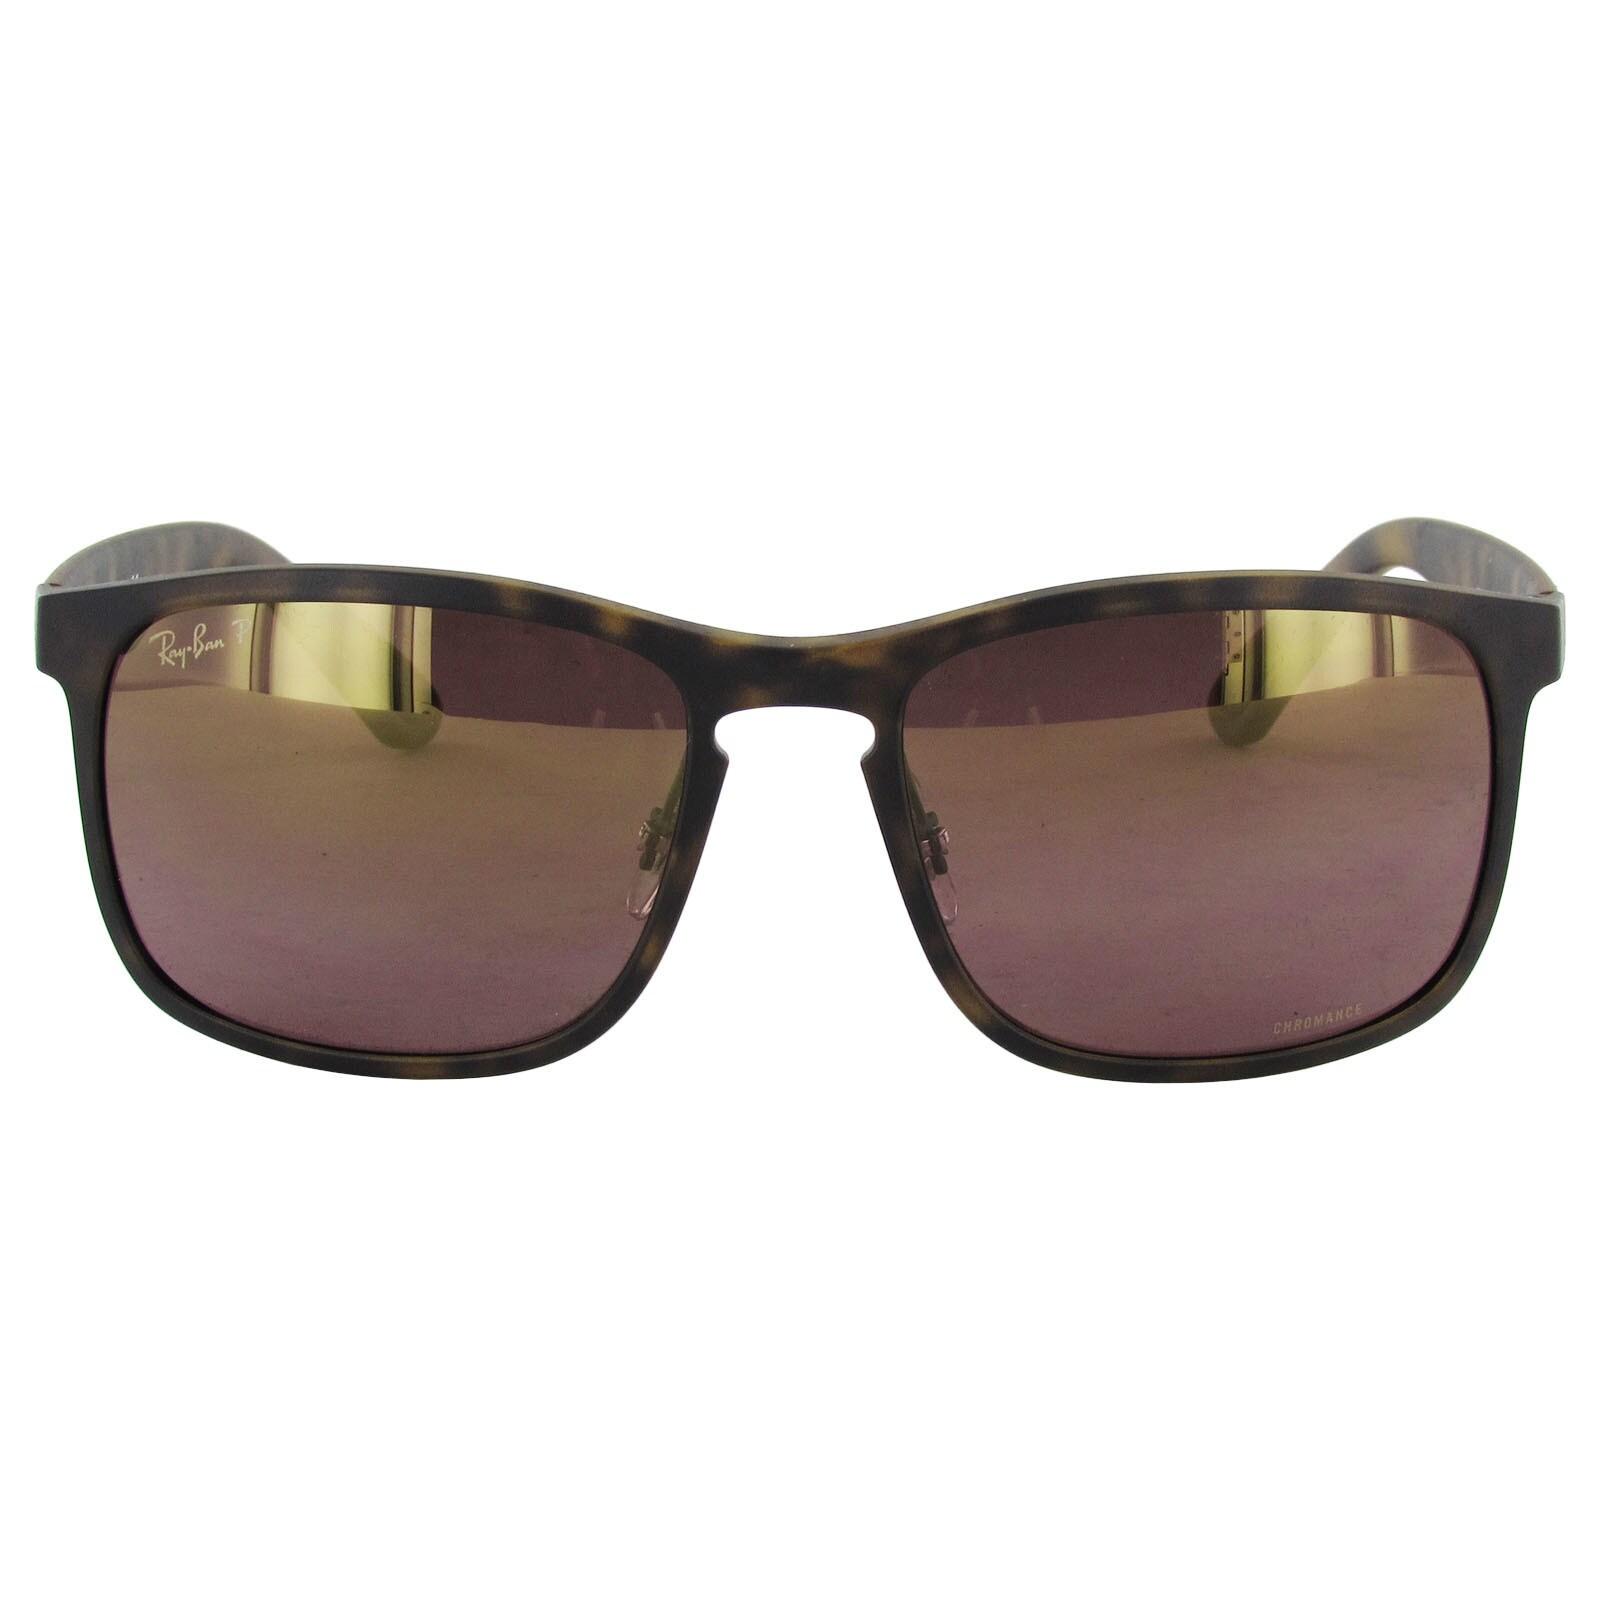 36696e642da Shop Ray-Ban Chromance RB4264 Mens Tortoise Frame Purple Mirror Polarized  Lens Sunglasses - Free Shipping Today - Overstock - 16288336